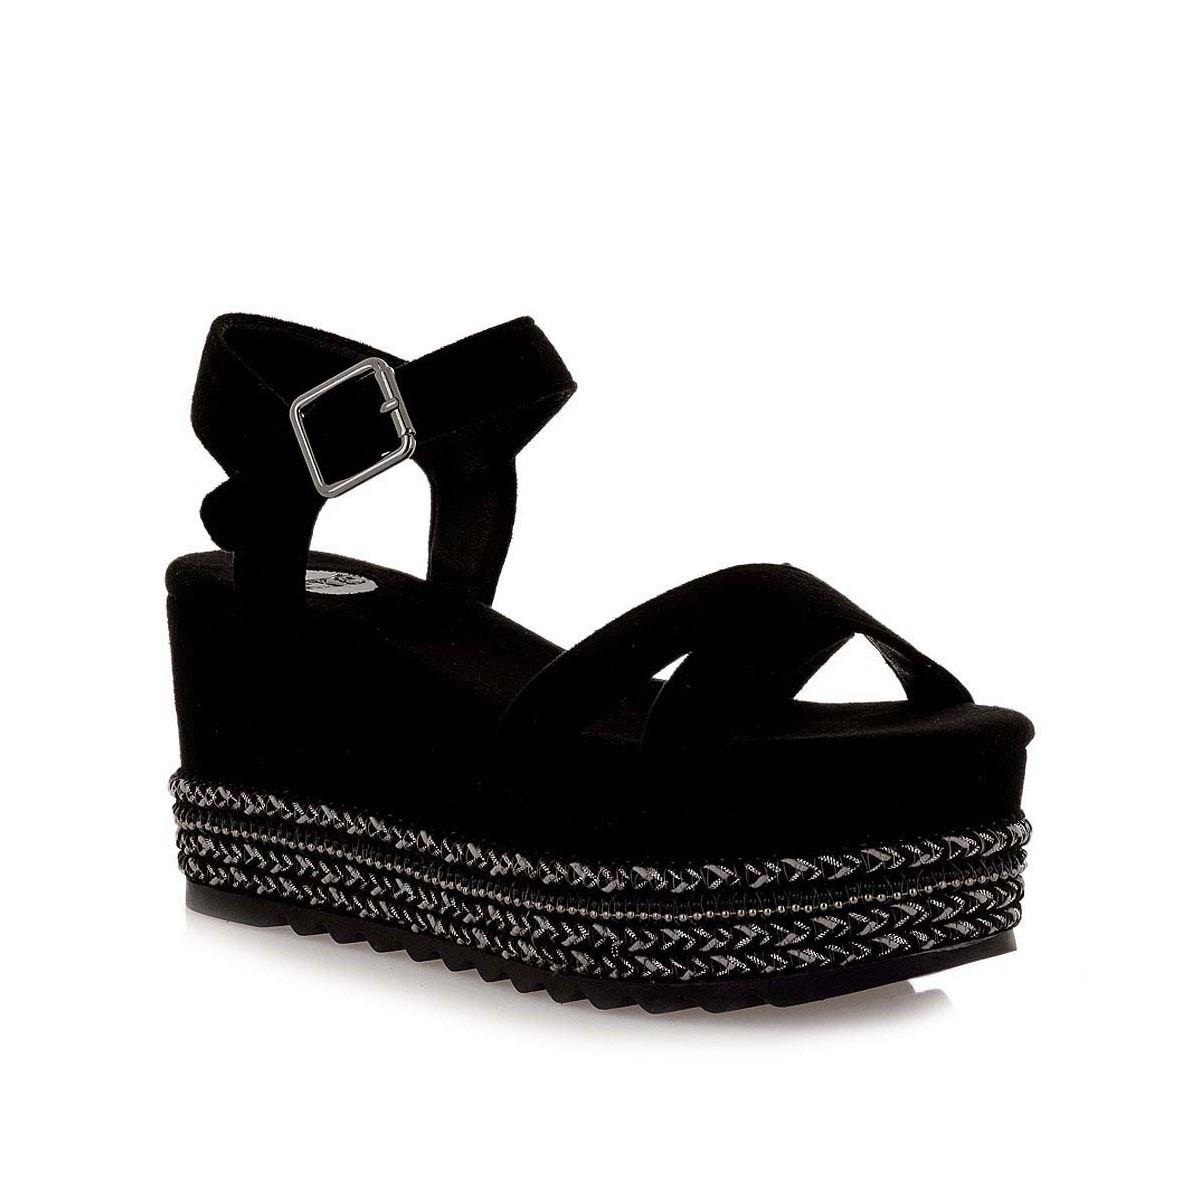 EXE Shoes Γυναικεία Πέδιλα Πλατφόρμες MACAU-716 Μαύρο Καστόρι G4700716716L  69b07cbacbc